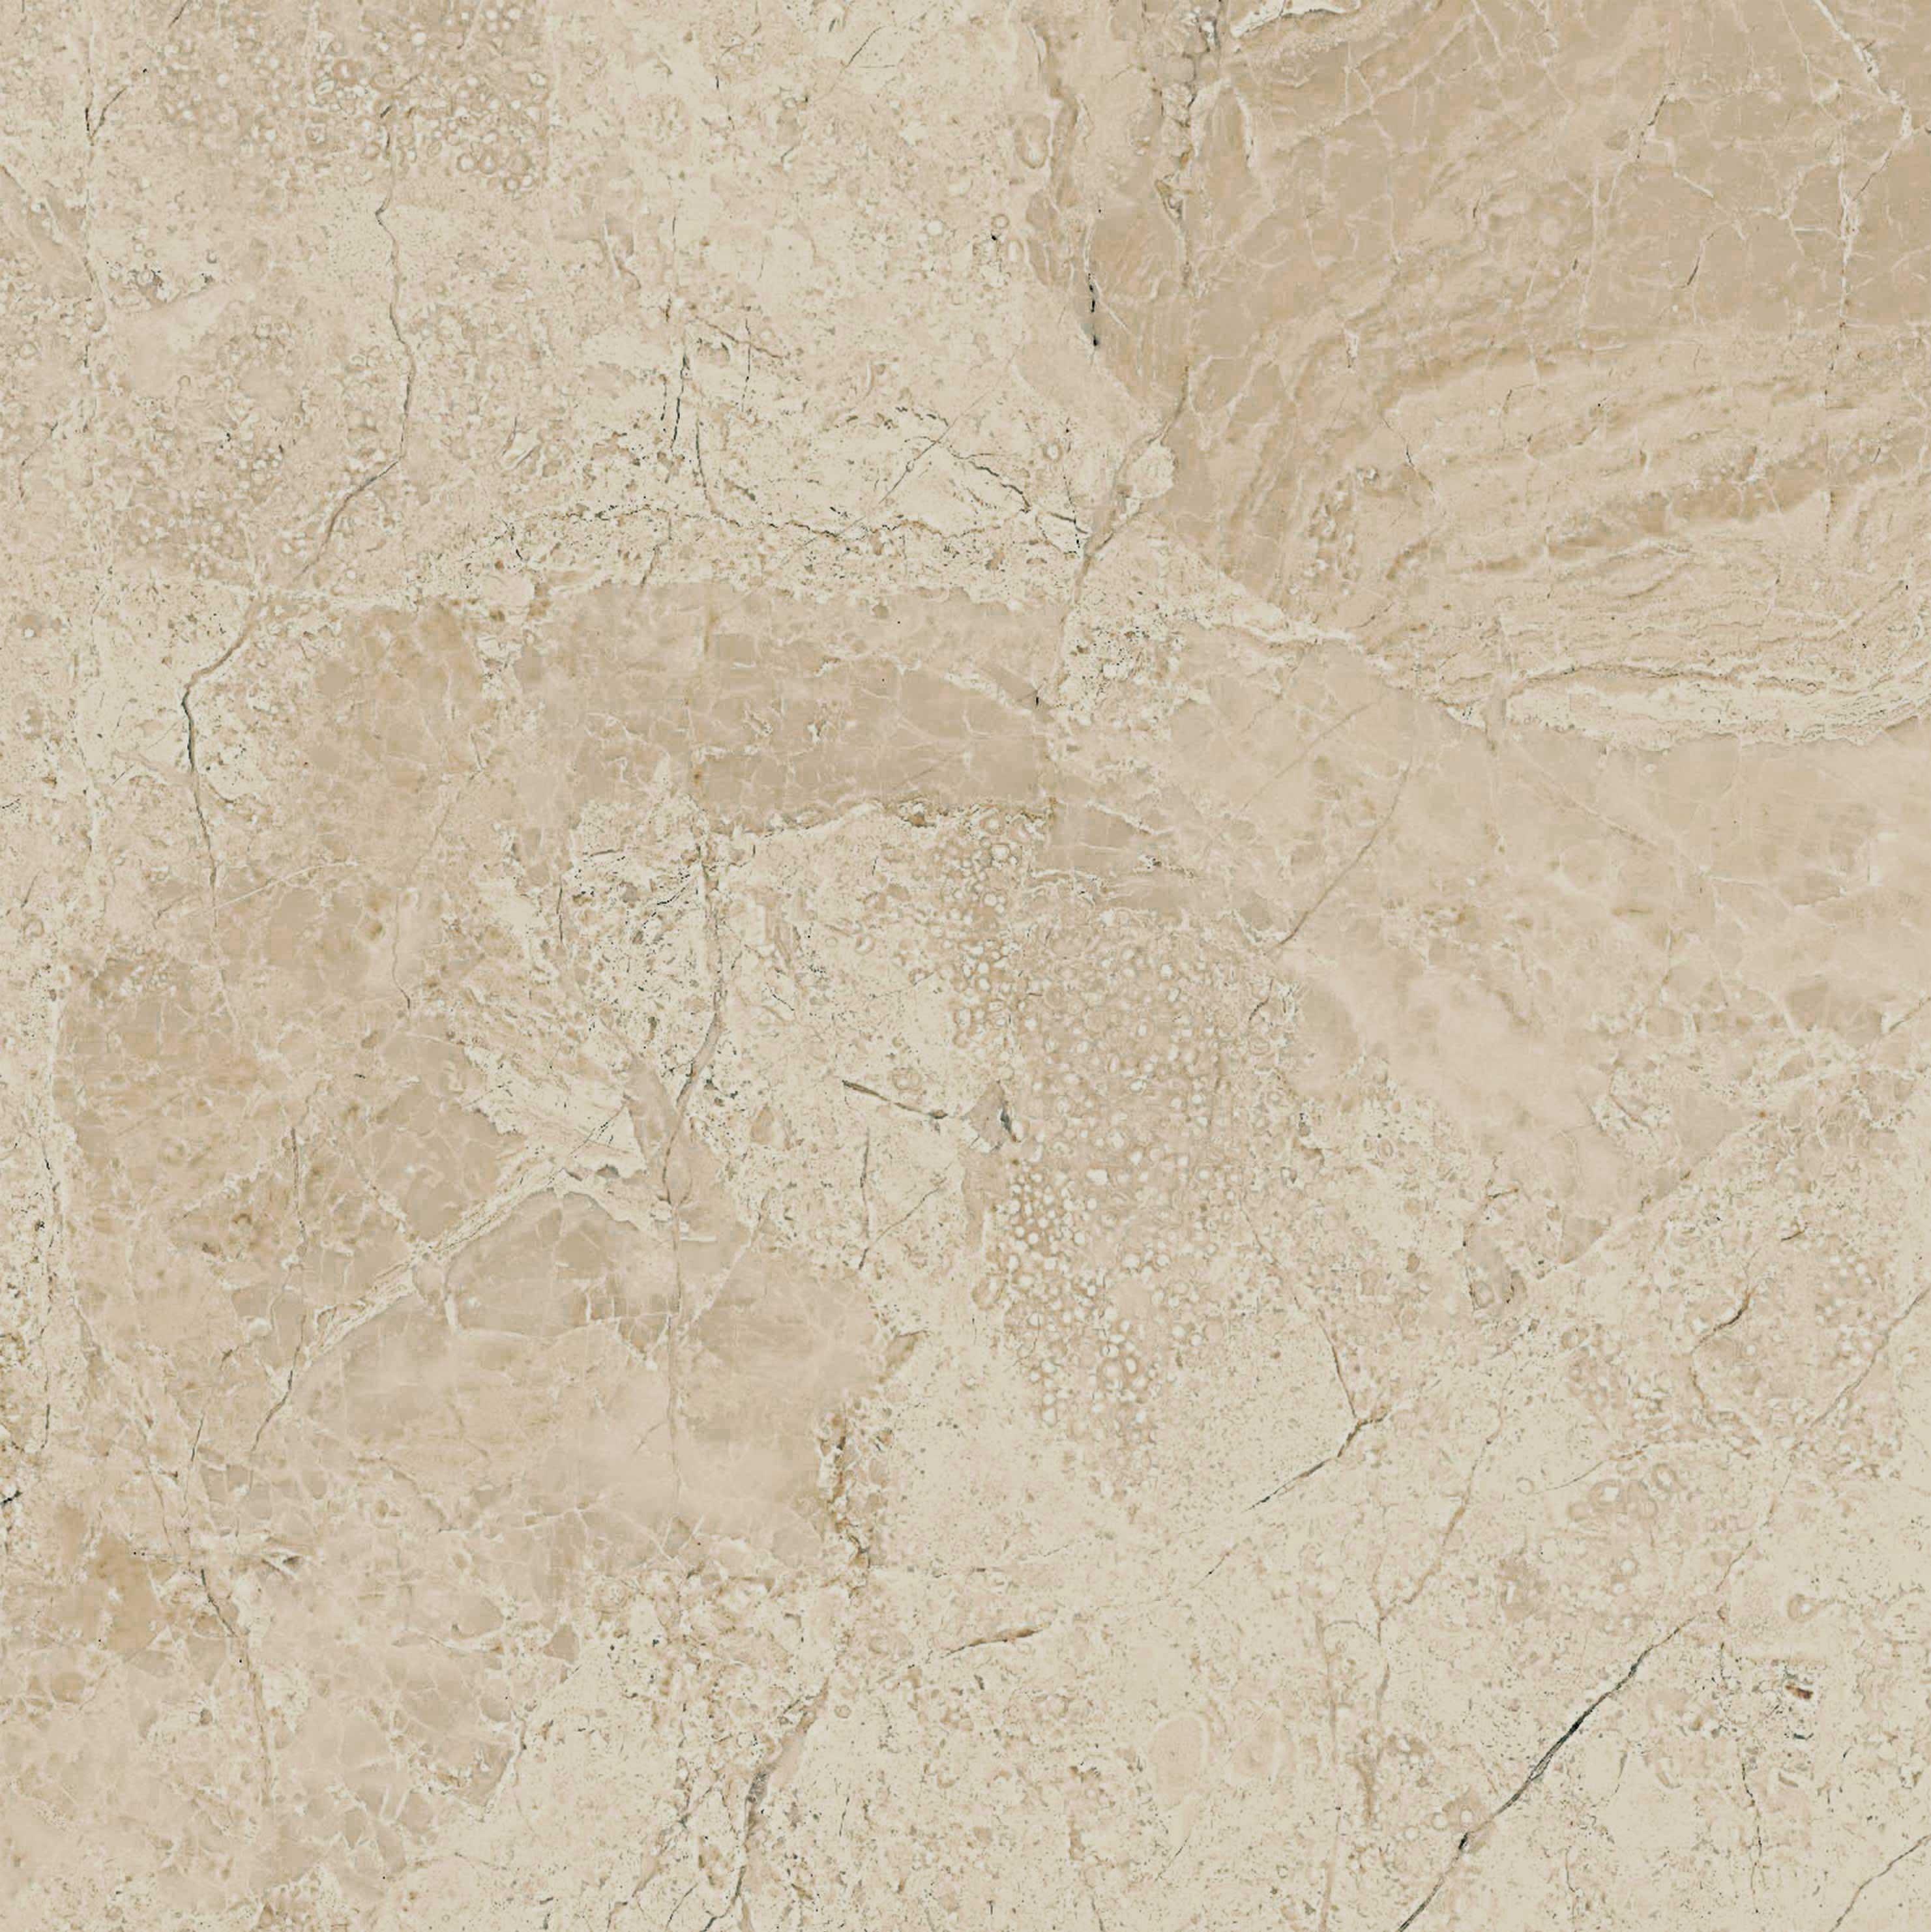 Gresie portelanata Cesarom Baccarin PEI 4, bej mat, patrata, 33 x 33 x 0,80 cm